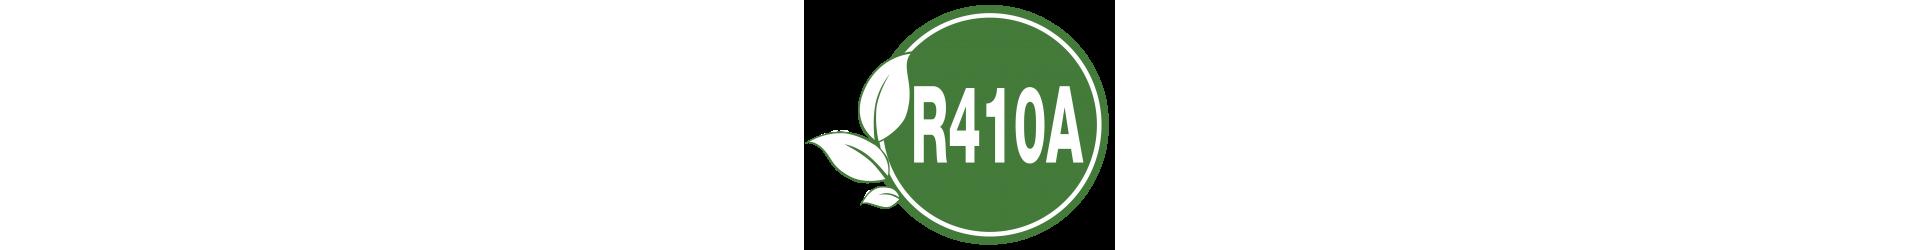 R410A Toshiba